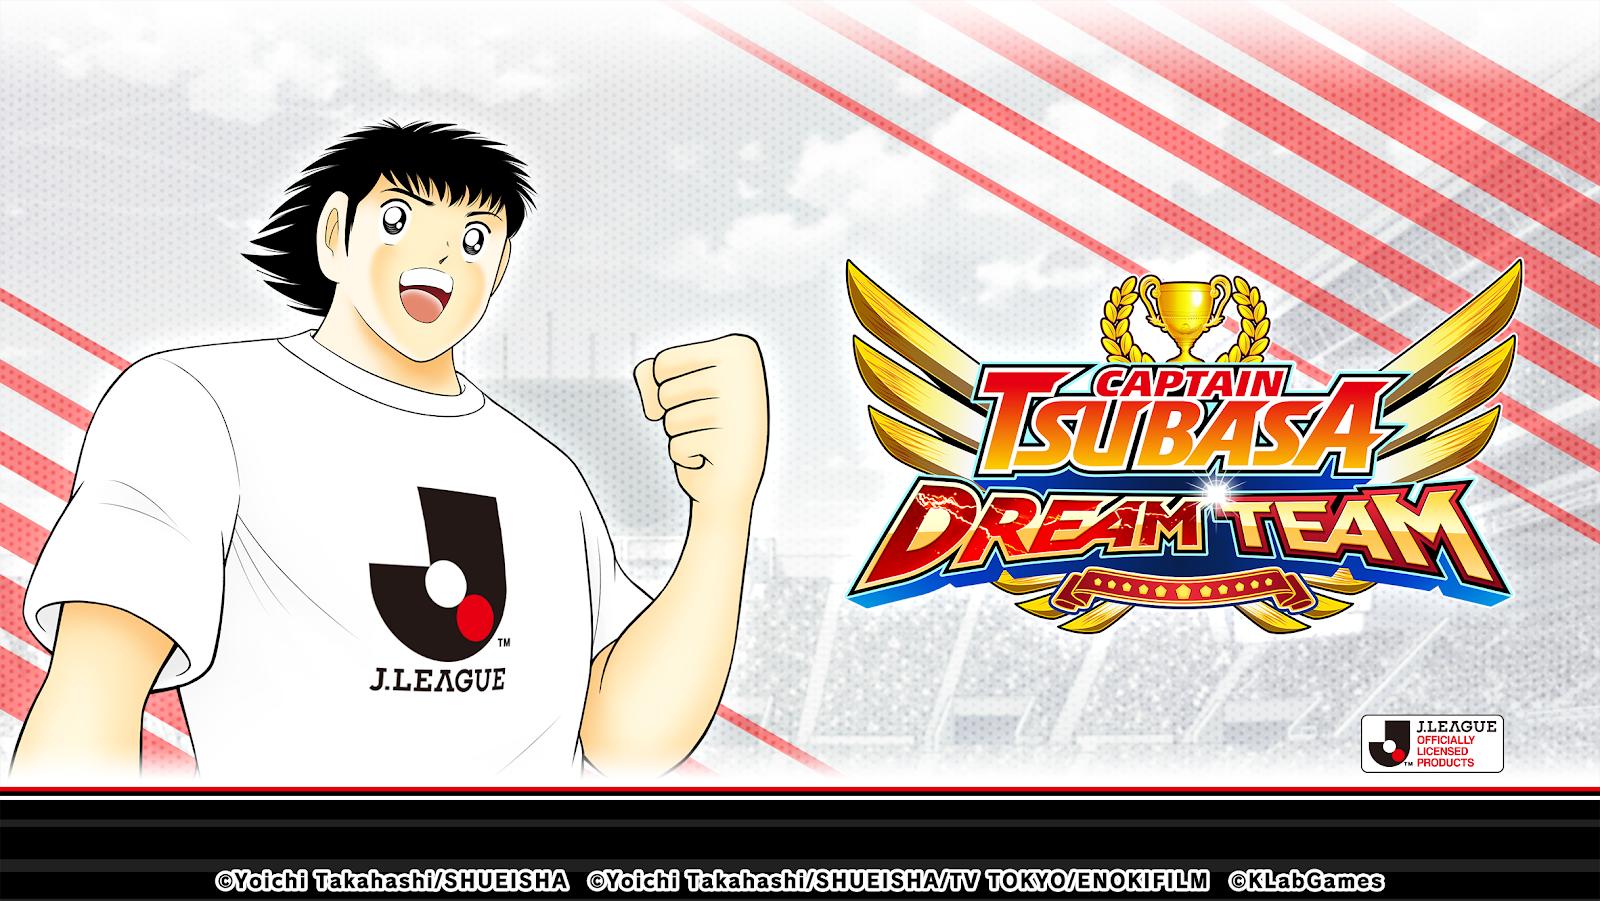 Captain Tsubasa: Dream Team เปิดตัวตัวละครผู้เล่นใหม่ในชุดยูนิฟอร์ม J.League